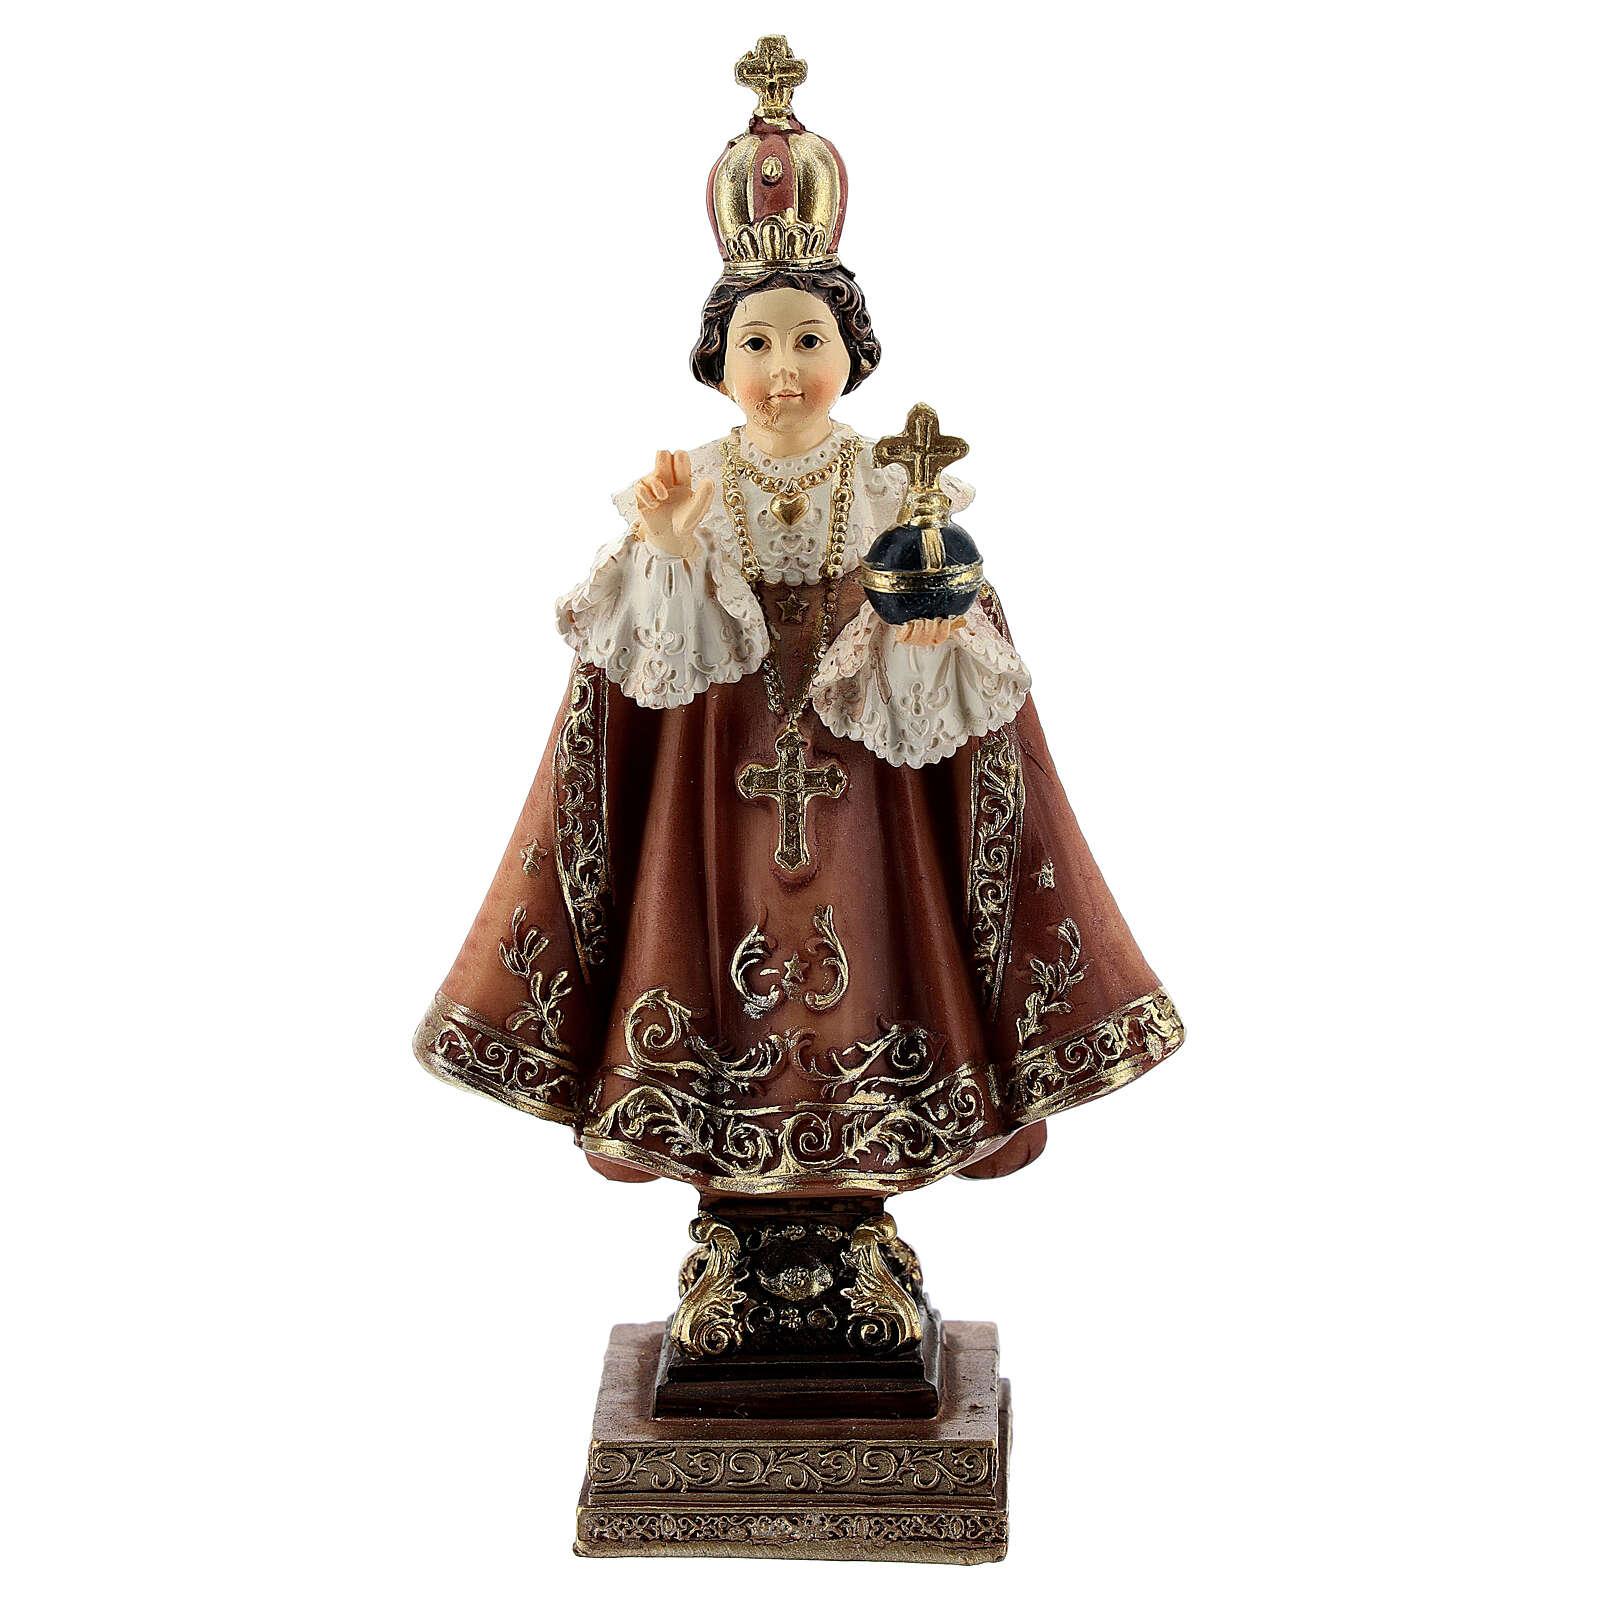 Bambino Praga base barocca statua resina 11 cm 4